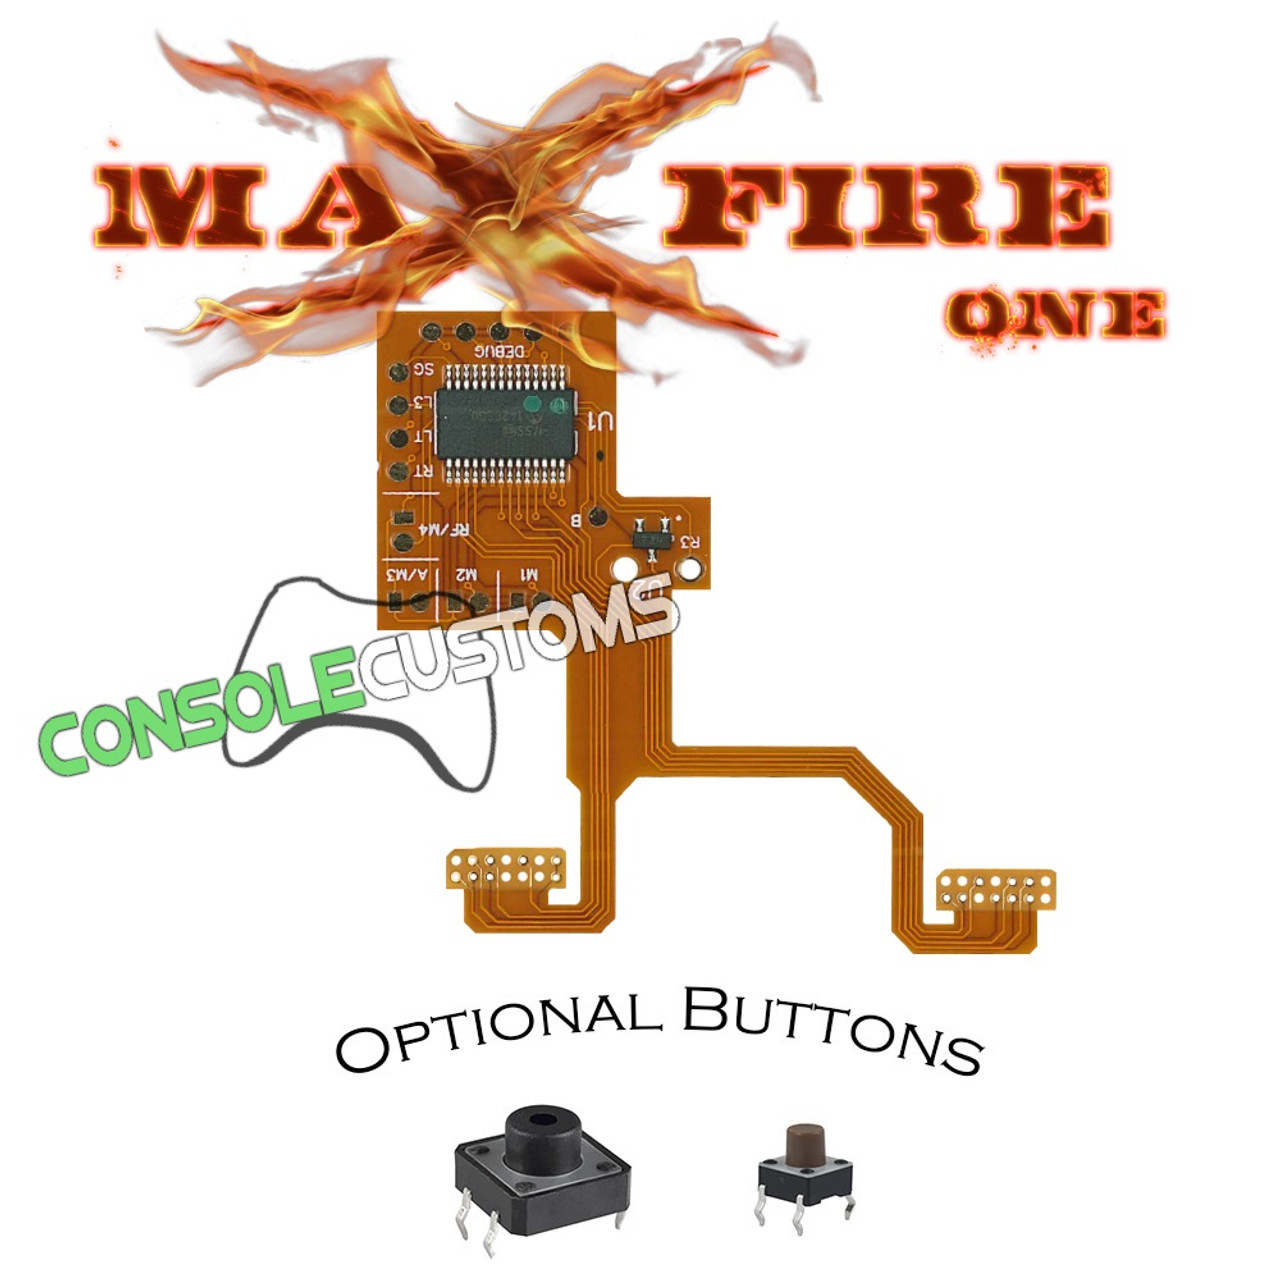 Xbox One MAXFIRE-REFLEX V3 button remapping flex mod